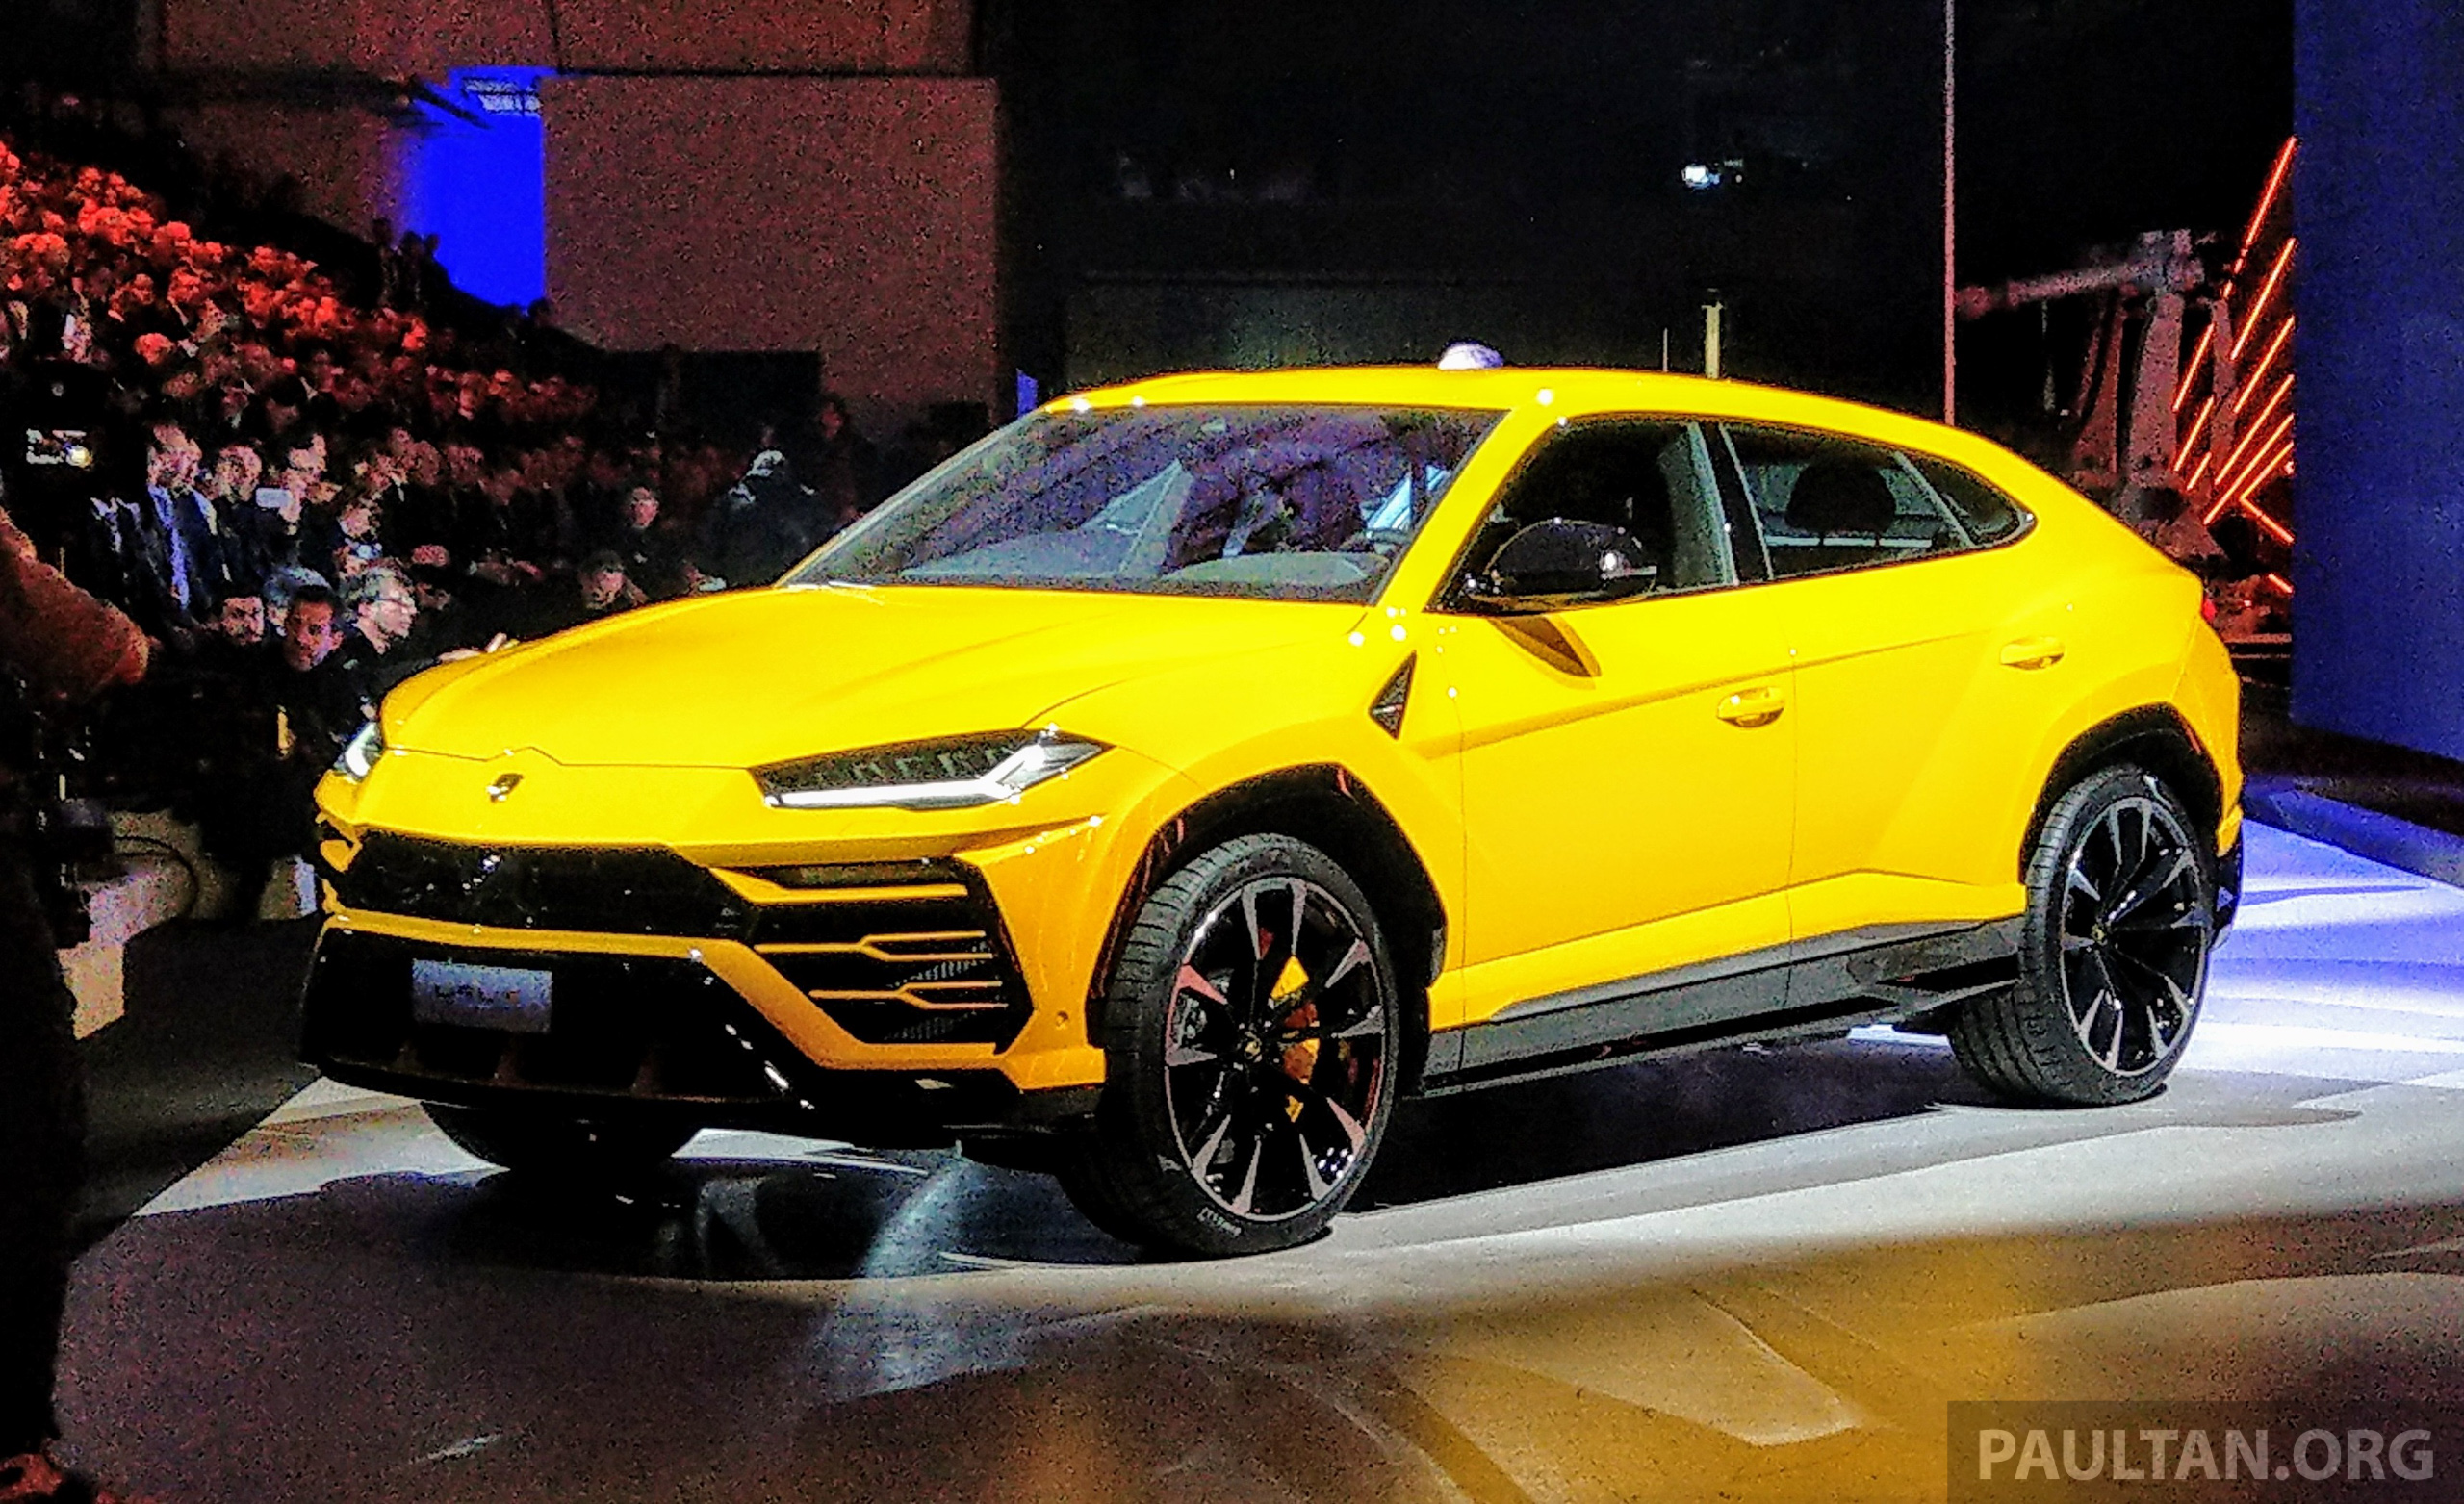 Urus Lamborghini >> Lamborghini Urus – Sant'Agata's 650 PS, 850 Nm SUV makes its official debut, deliveries begin in ...